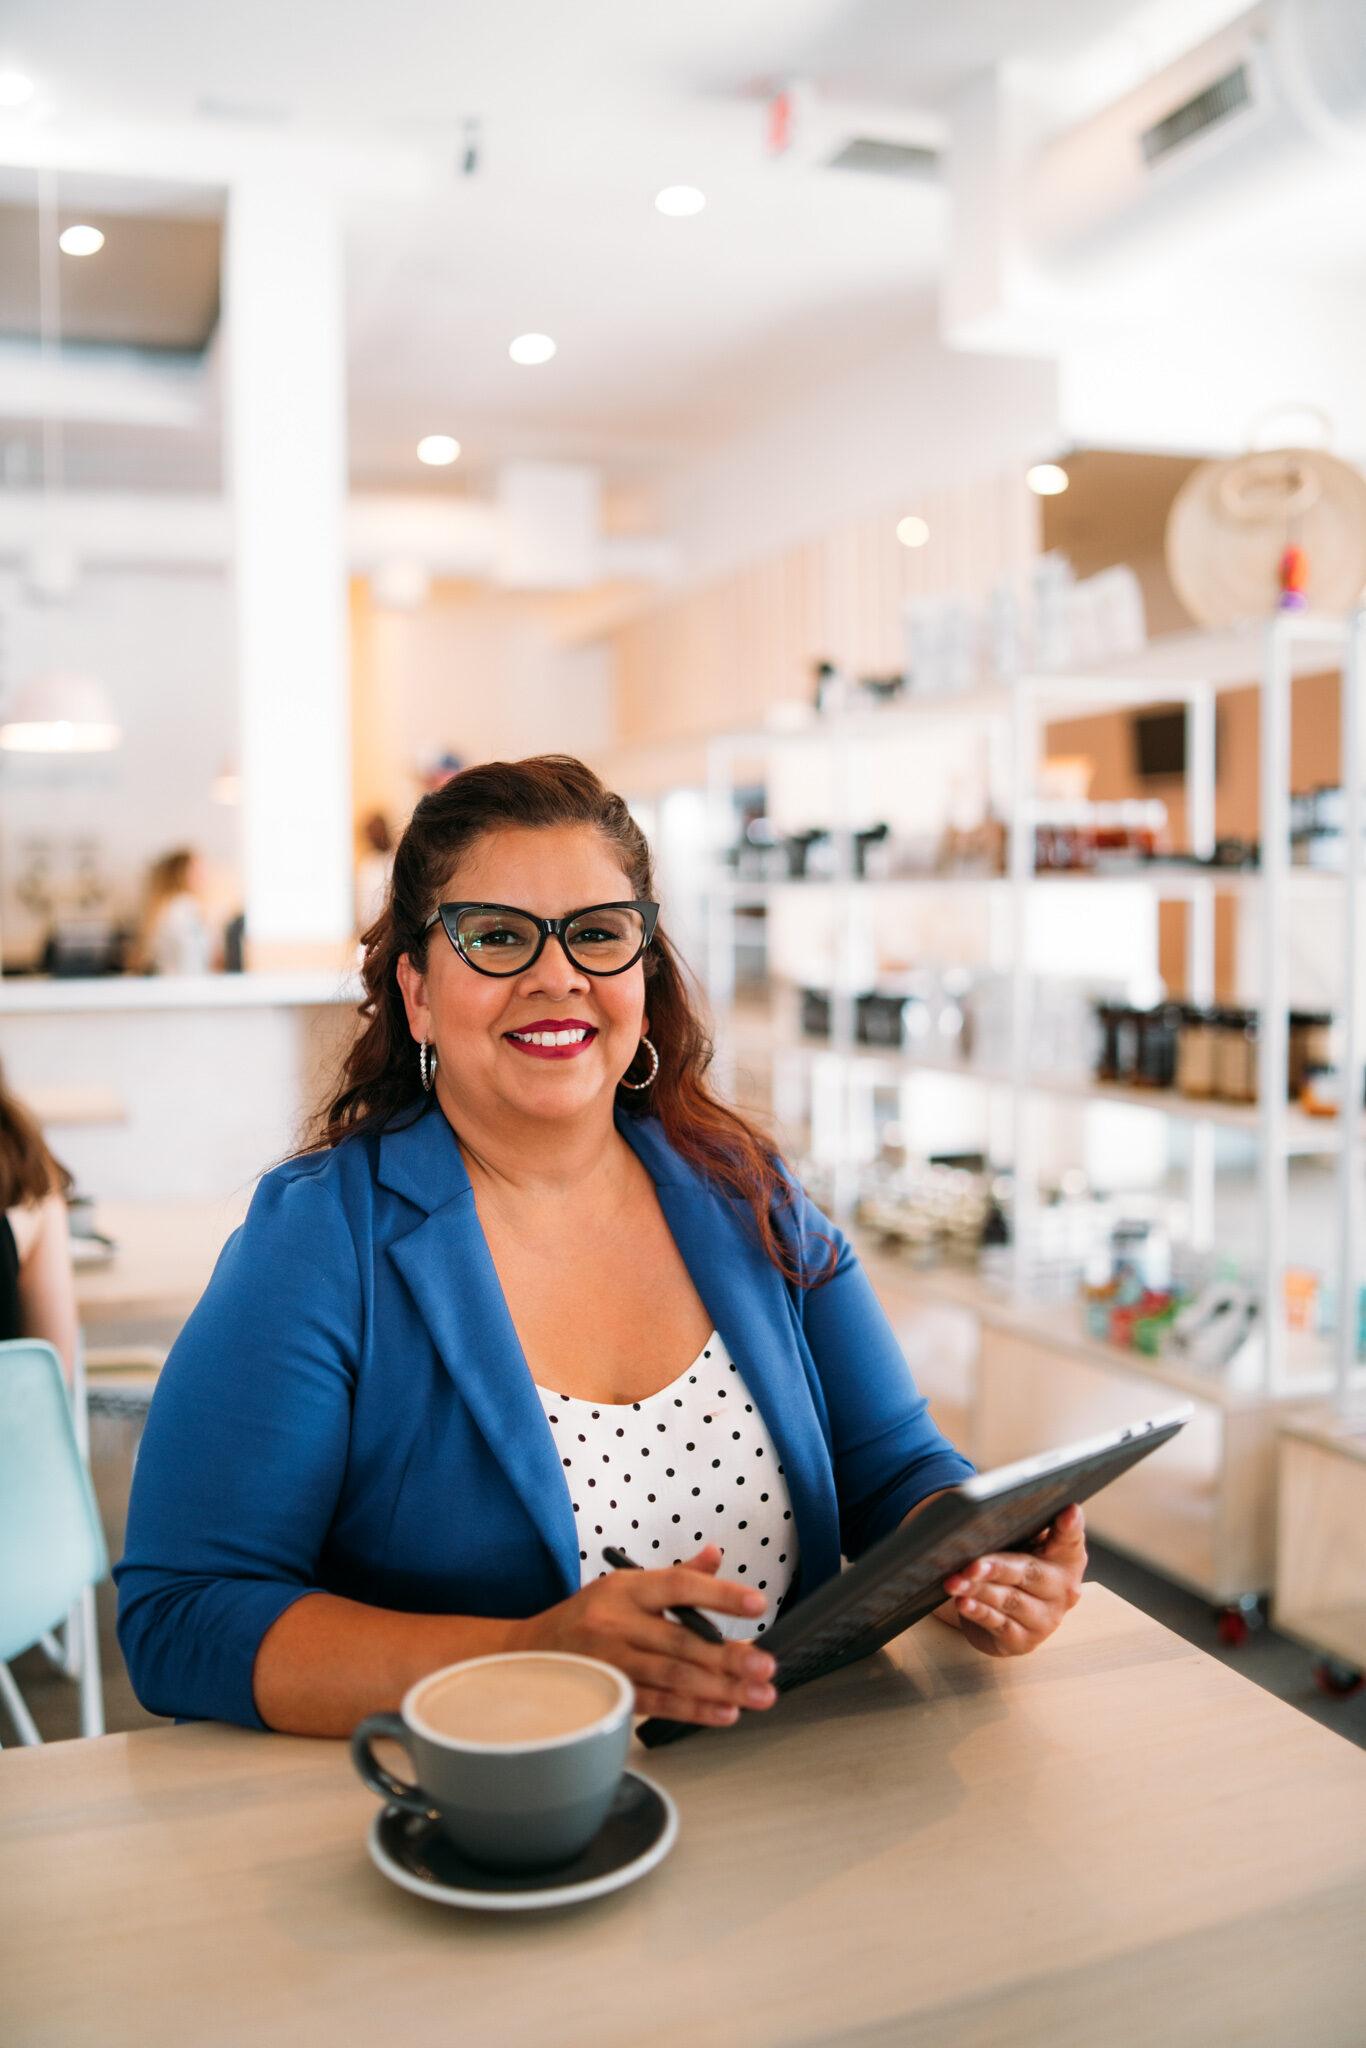 Grant Writing Expert Arlene Siller provides Grant Resources